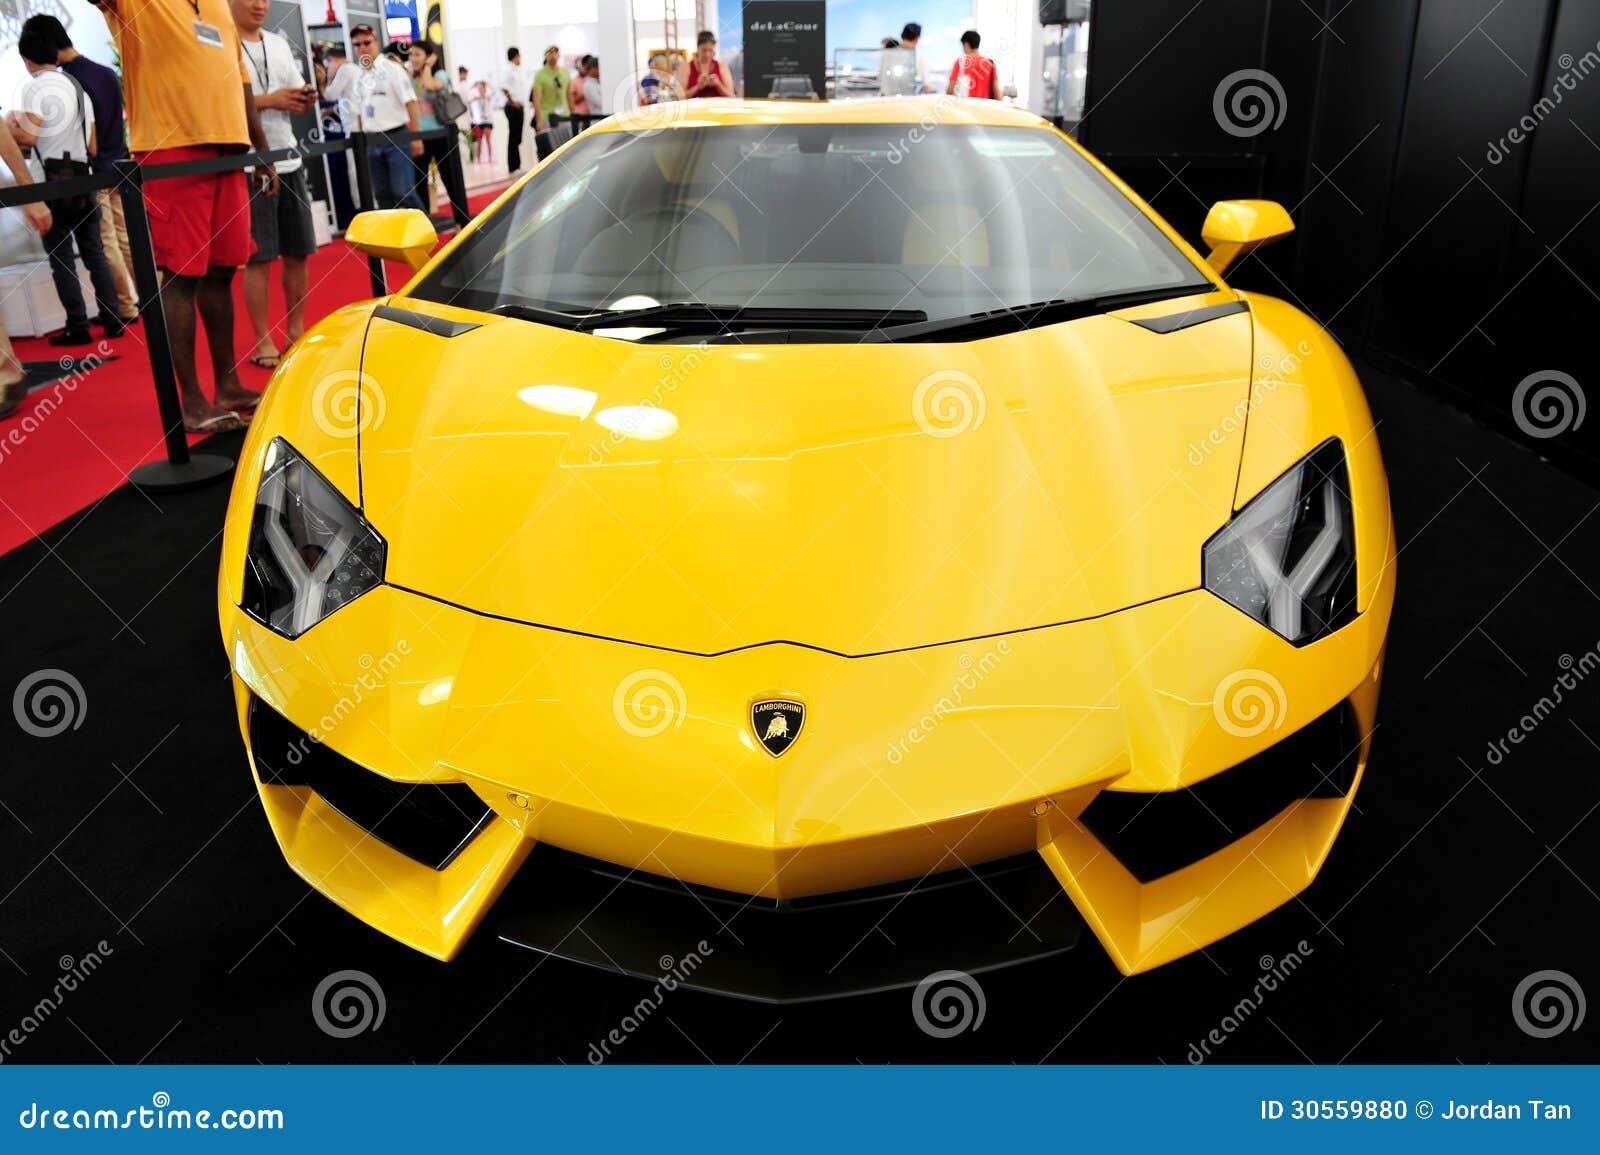 Bright Yellow Lamborghini Aventador On Display At The Singapore